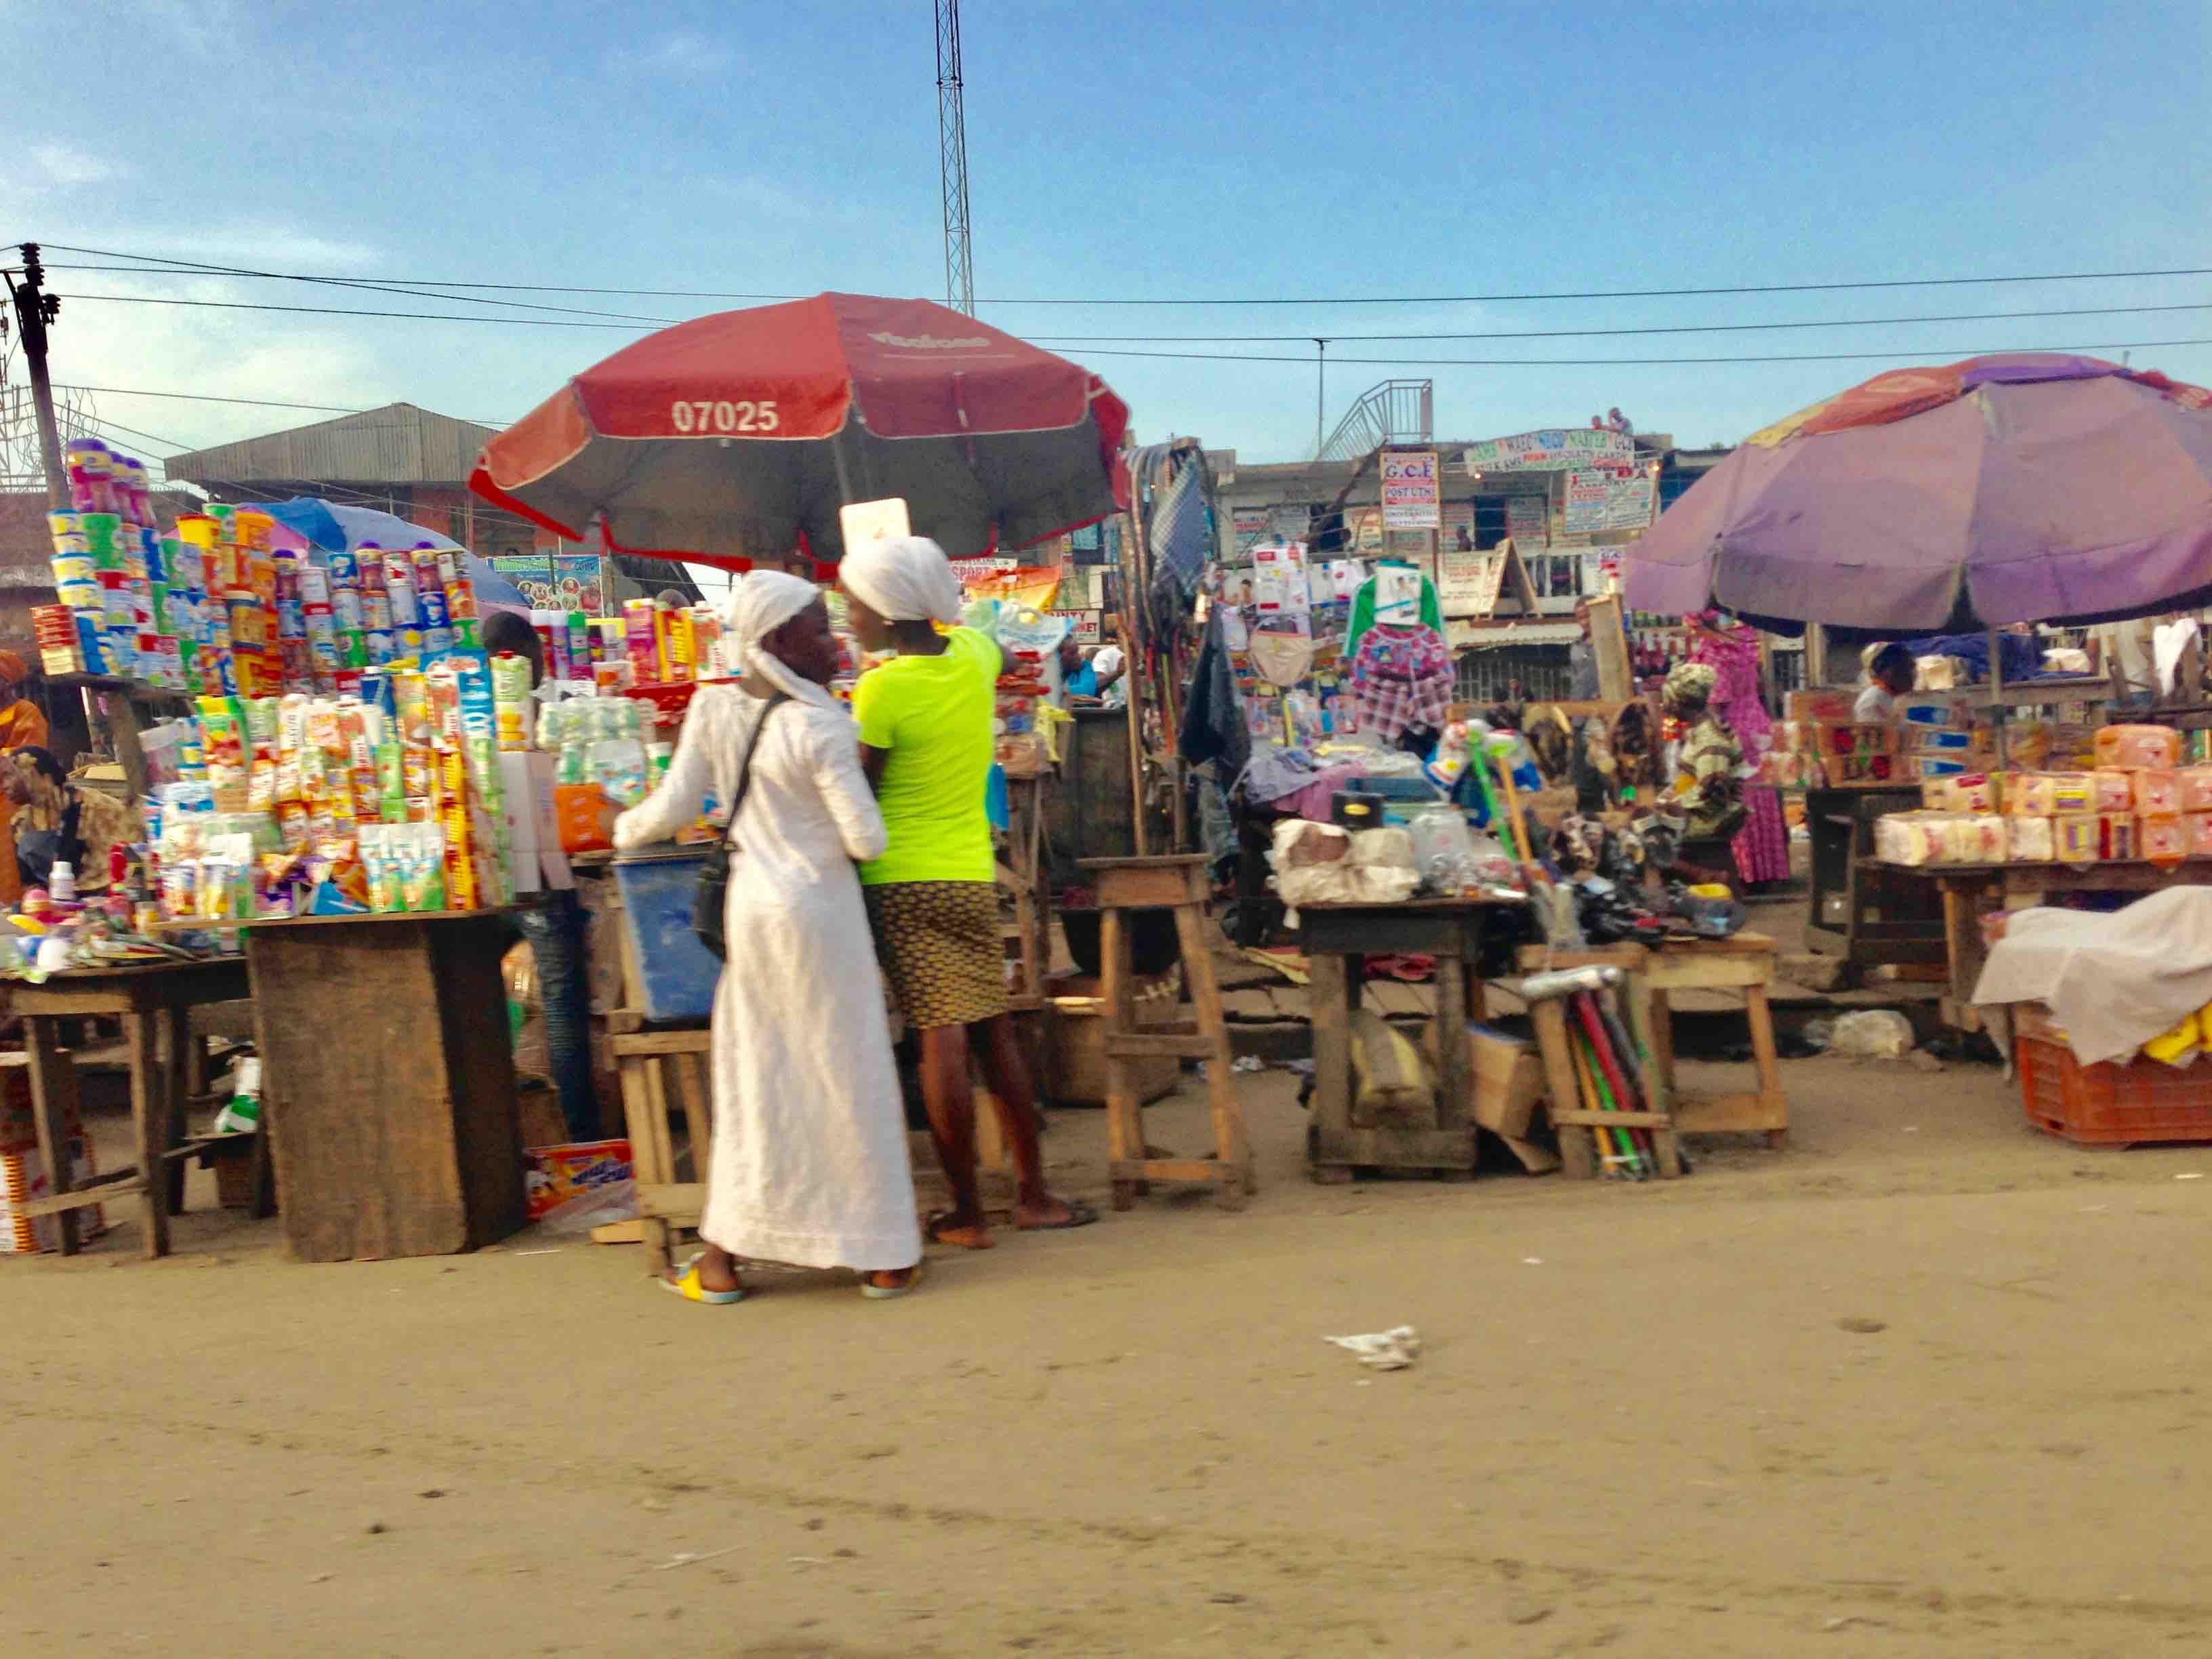 Roadside market scene, Lagos - Badagry Expressway, Lagos State, Nigeria. #JujuFilms